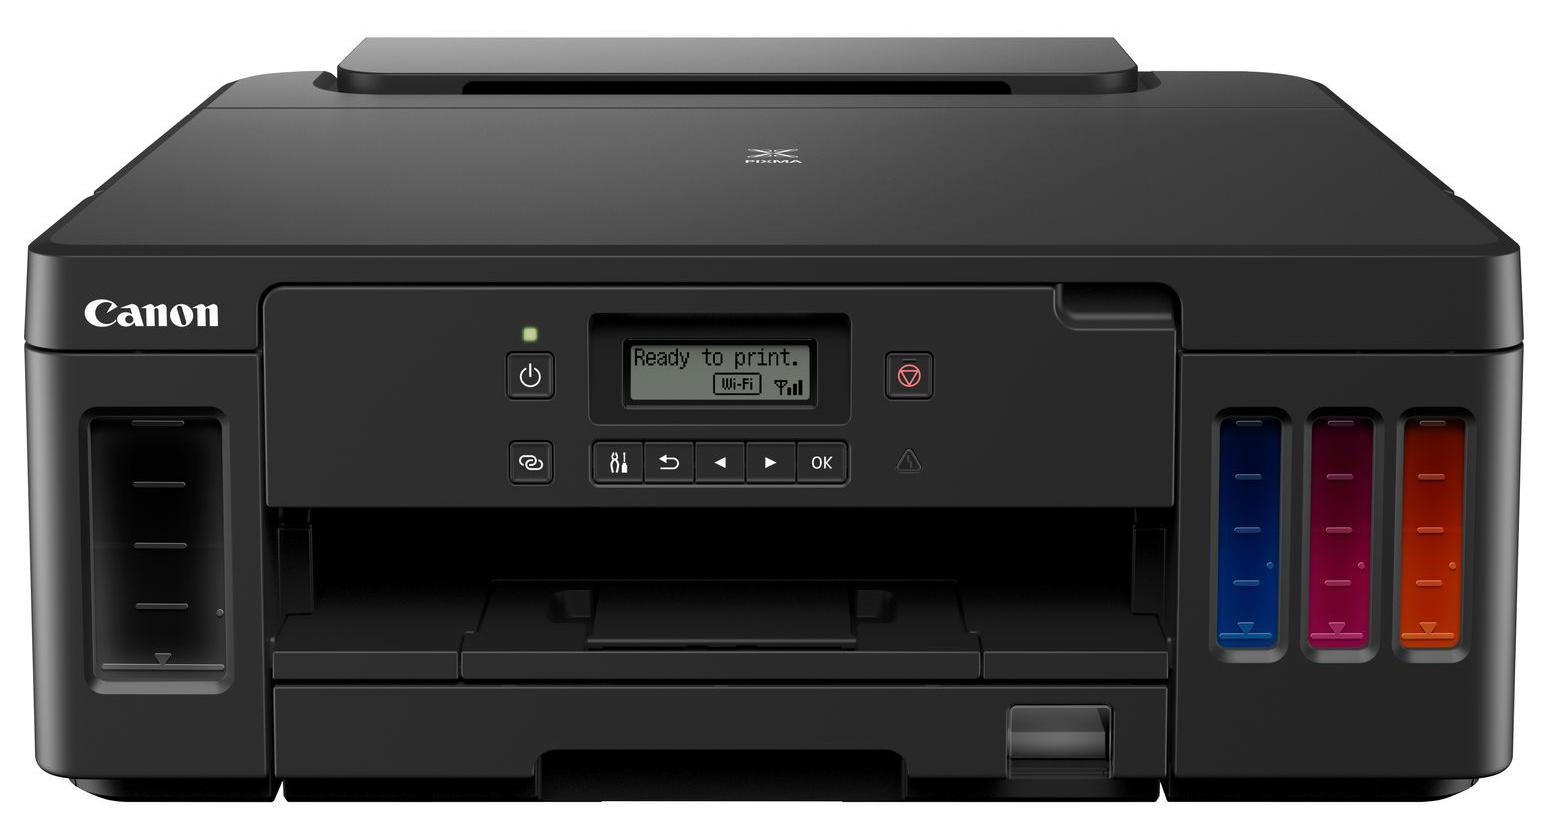 CANON PIXMA G5050 INKJET PRINTER COLOUR 4800 X 1200 DPI A4 WI-FI